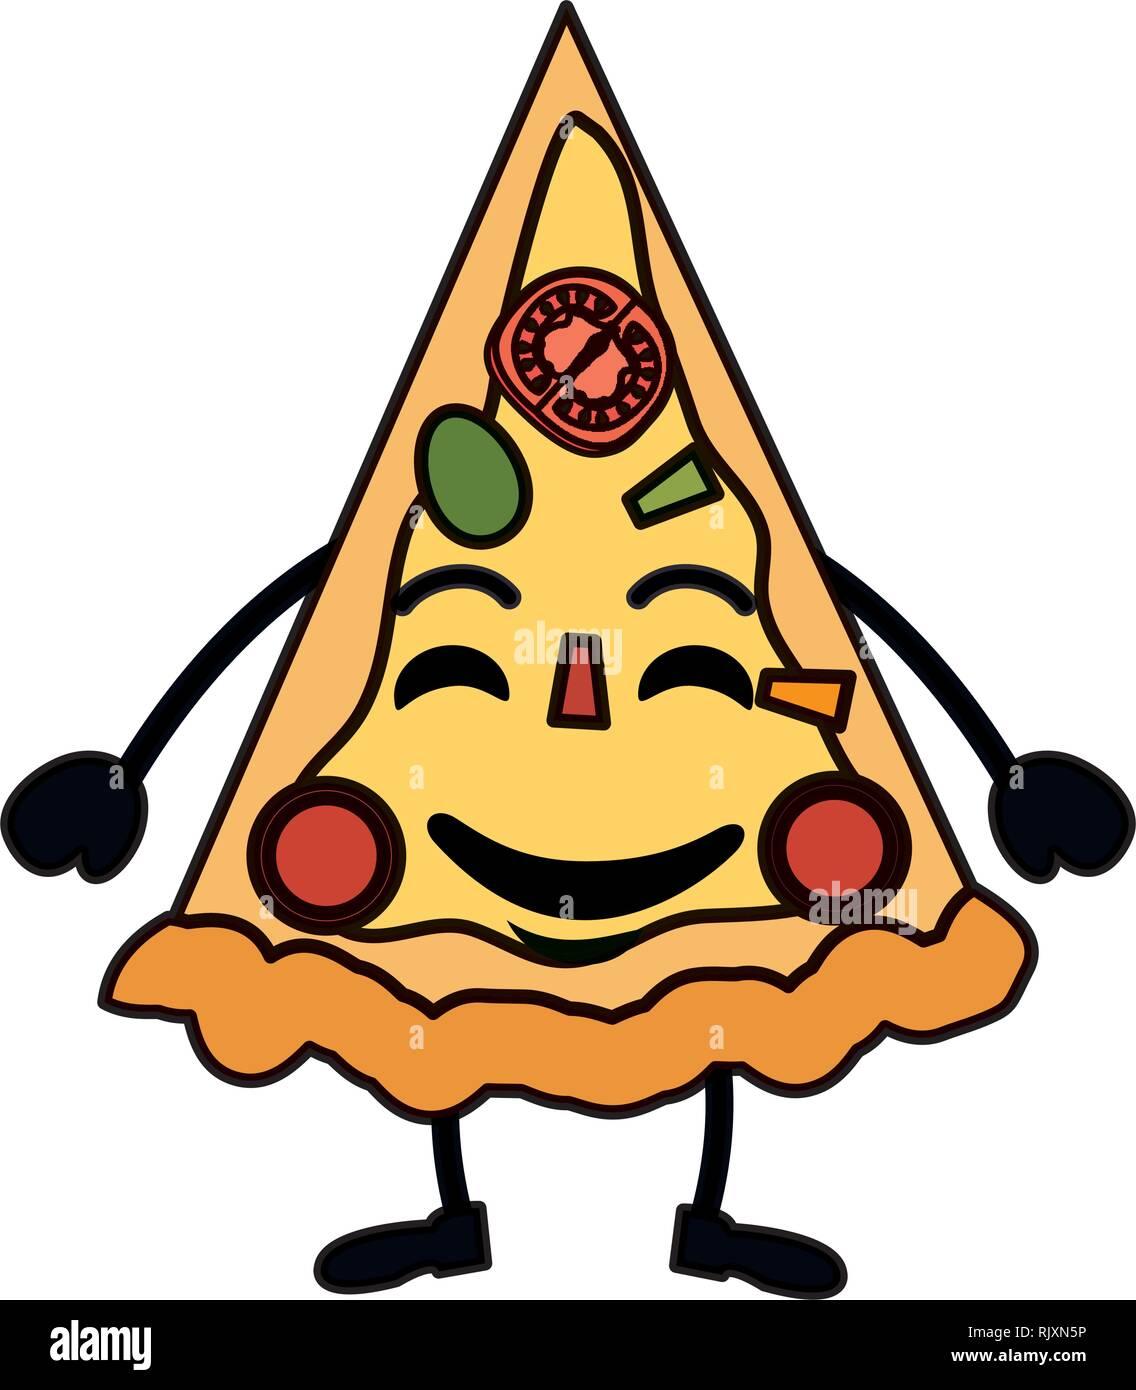 Leckere Pizza Kawaii Charakter Vektor Abbildung Bild